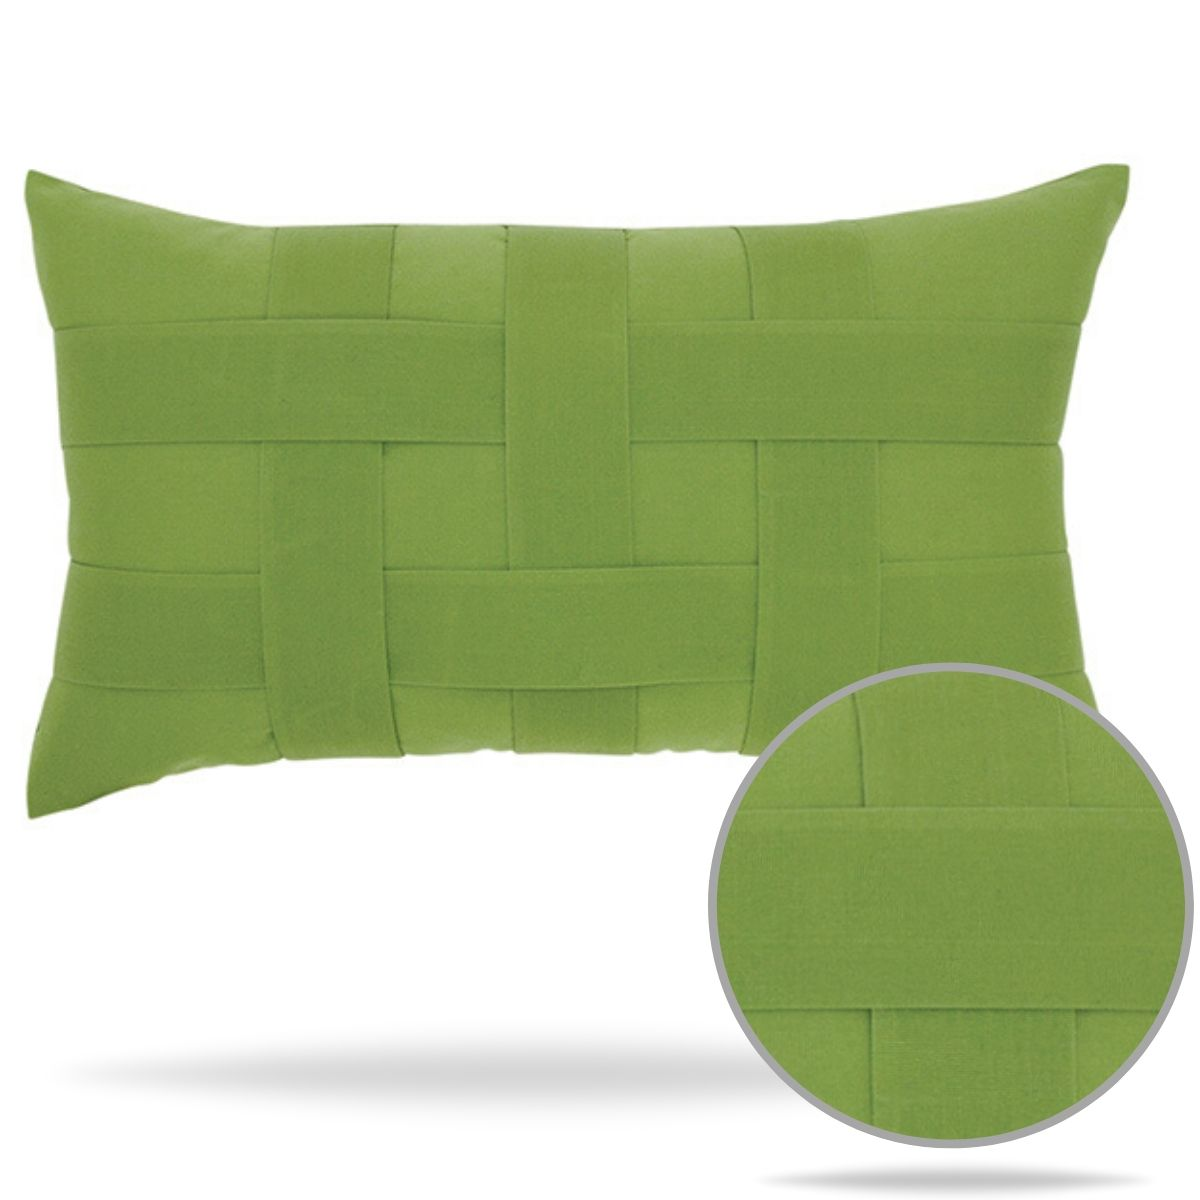 basketweave-ginko-lumbar pillow elaine-smith-nd13.jpg